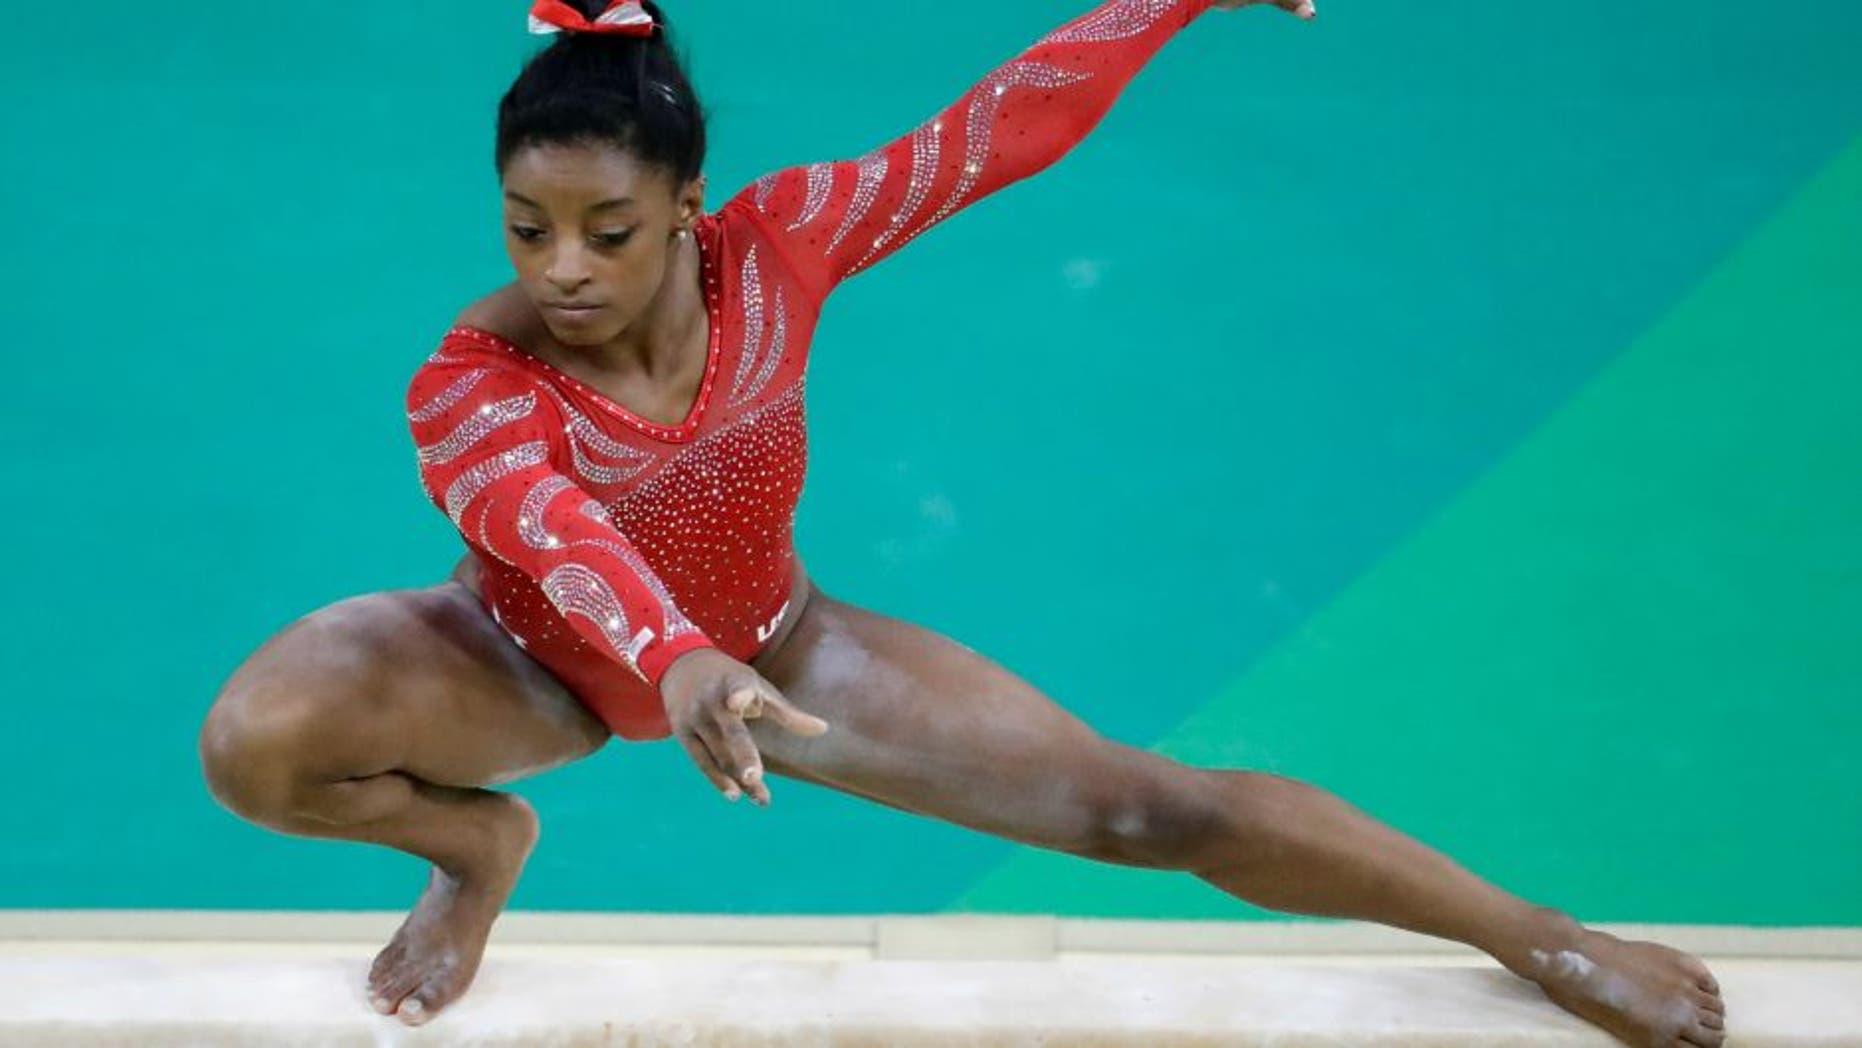 United States' Simone Biles trains on the balance beam ahead of the 2016 Summer Olympics in Rio de Janeiro, Brazil, Thursday, Aug. 4, 2016. (AP Photo/Julio Cortez)